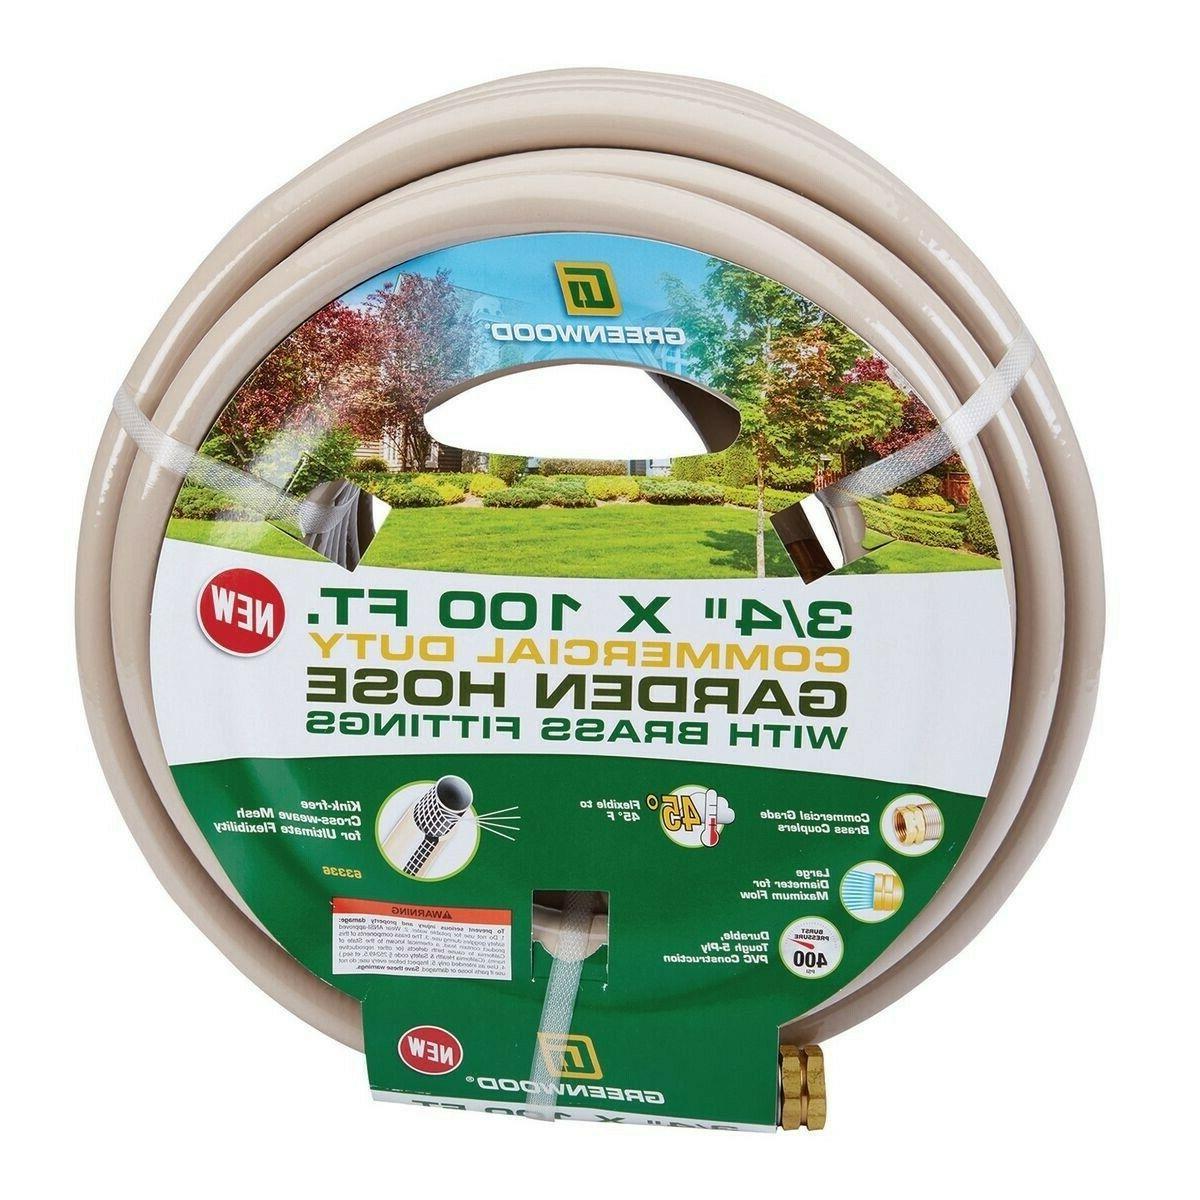 Greenwood® 3/4 In. X 100 Foot Commercial Duty Garden Hose